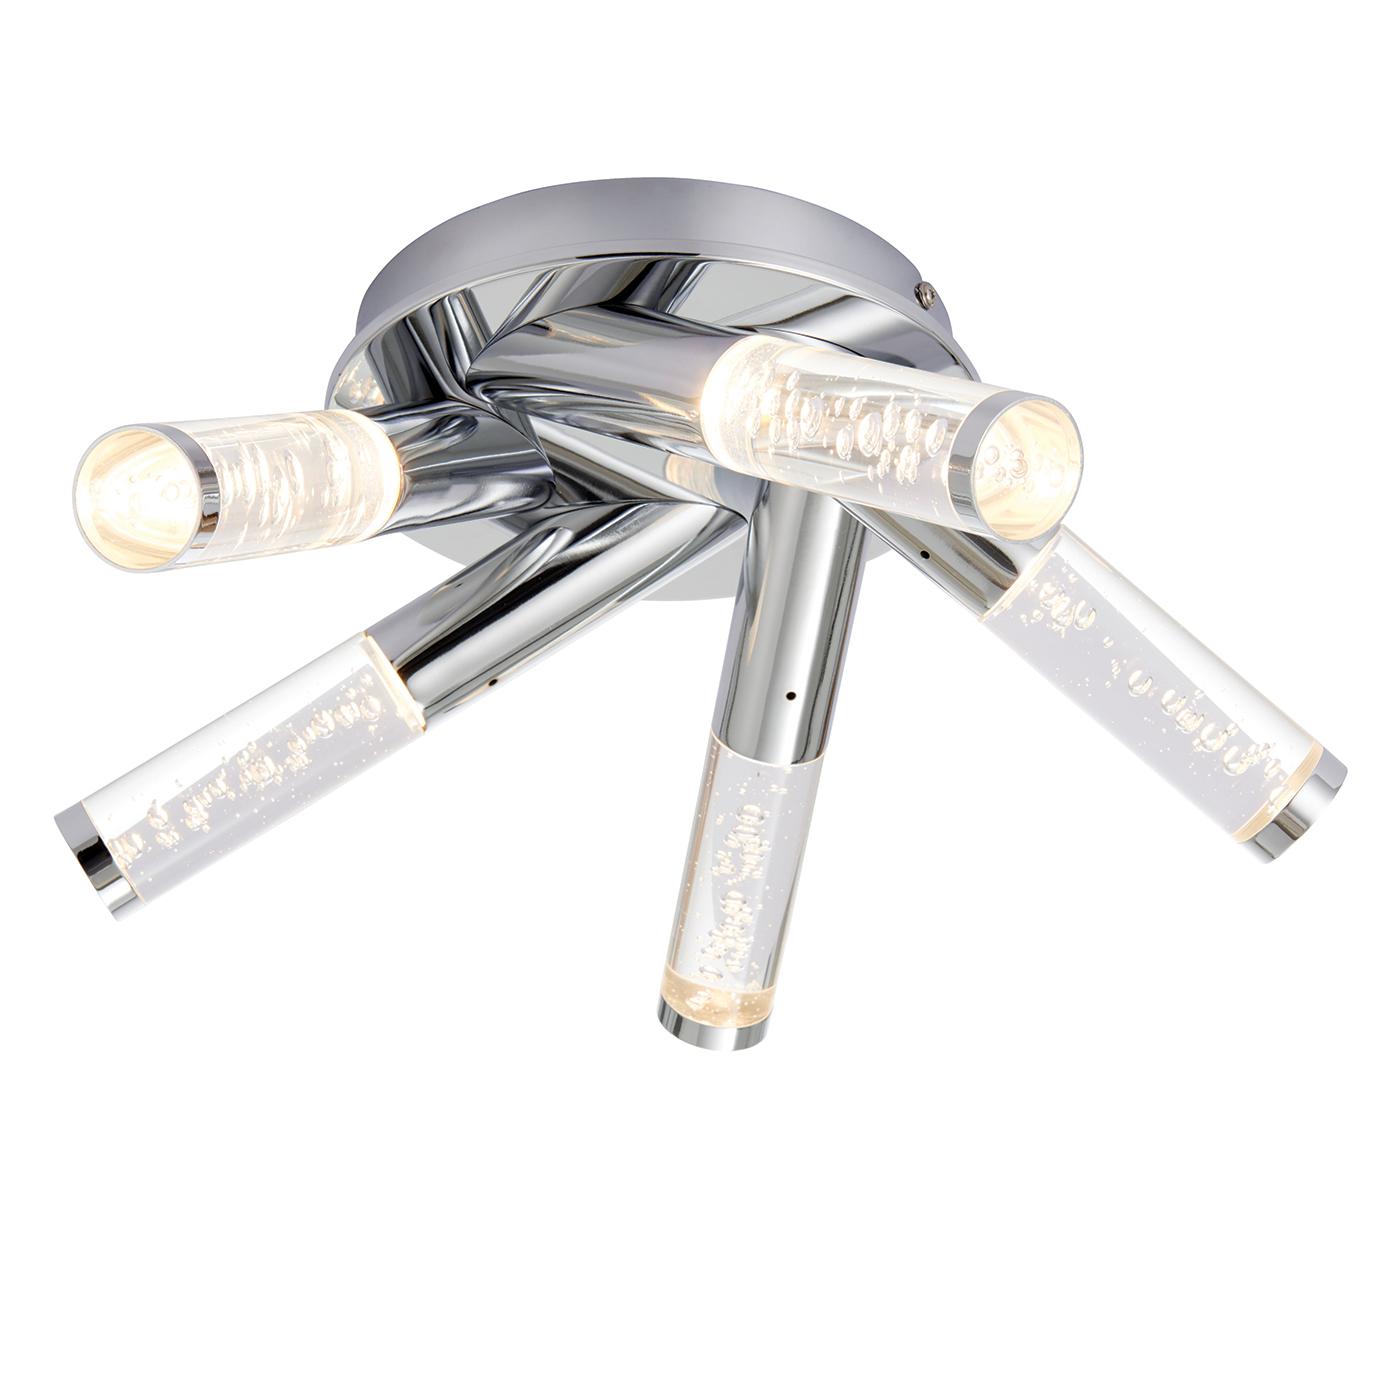 buy popular fb385 daa27 Details about Endon Essence flush LED bathroom ceiling light IP44 5x 3W  chrome acrylic bubbles